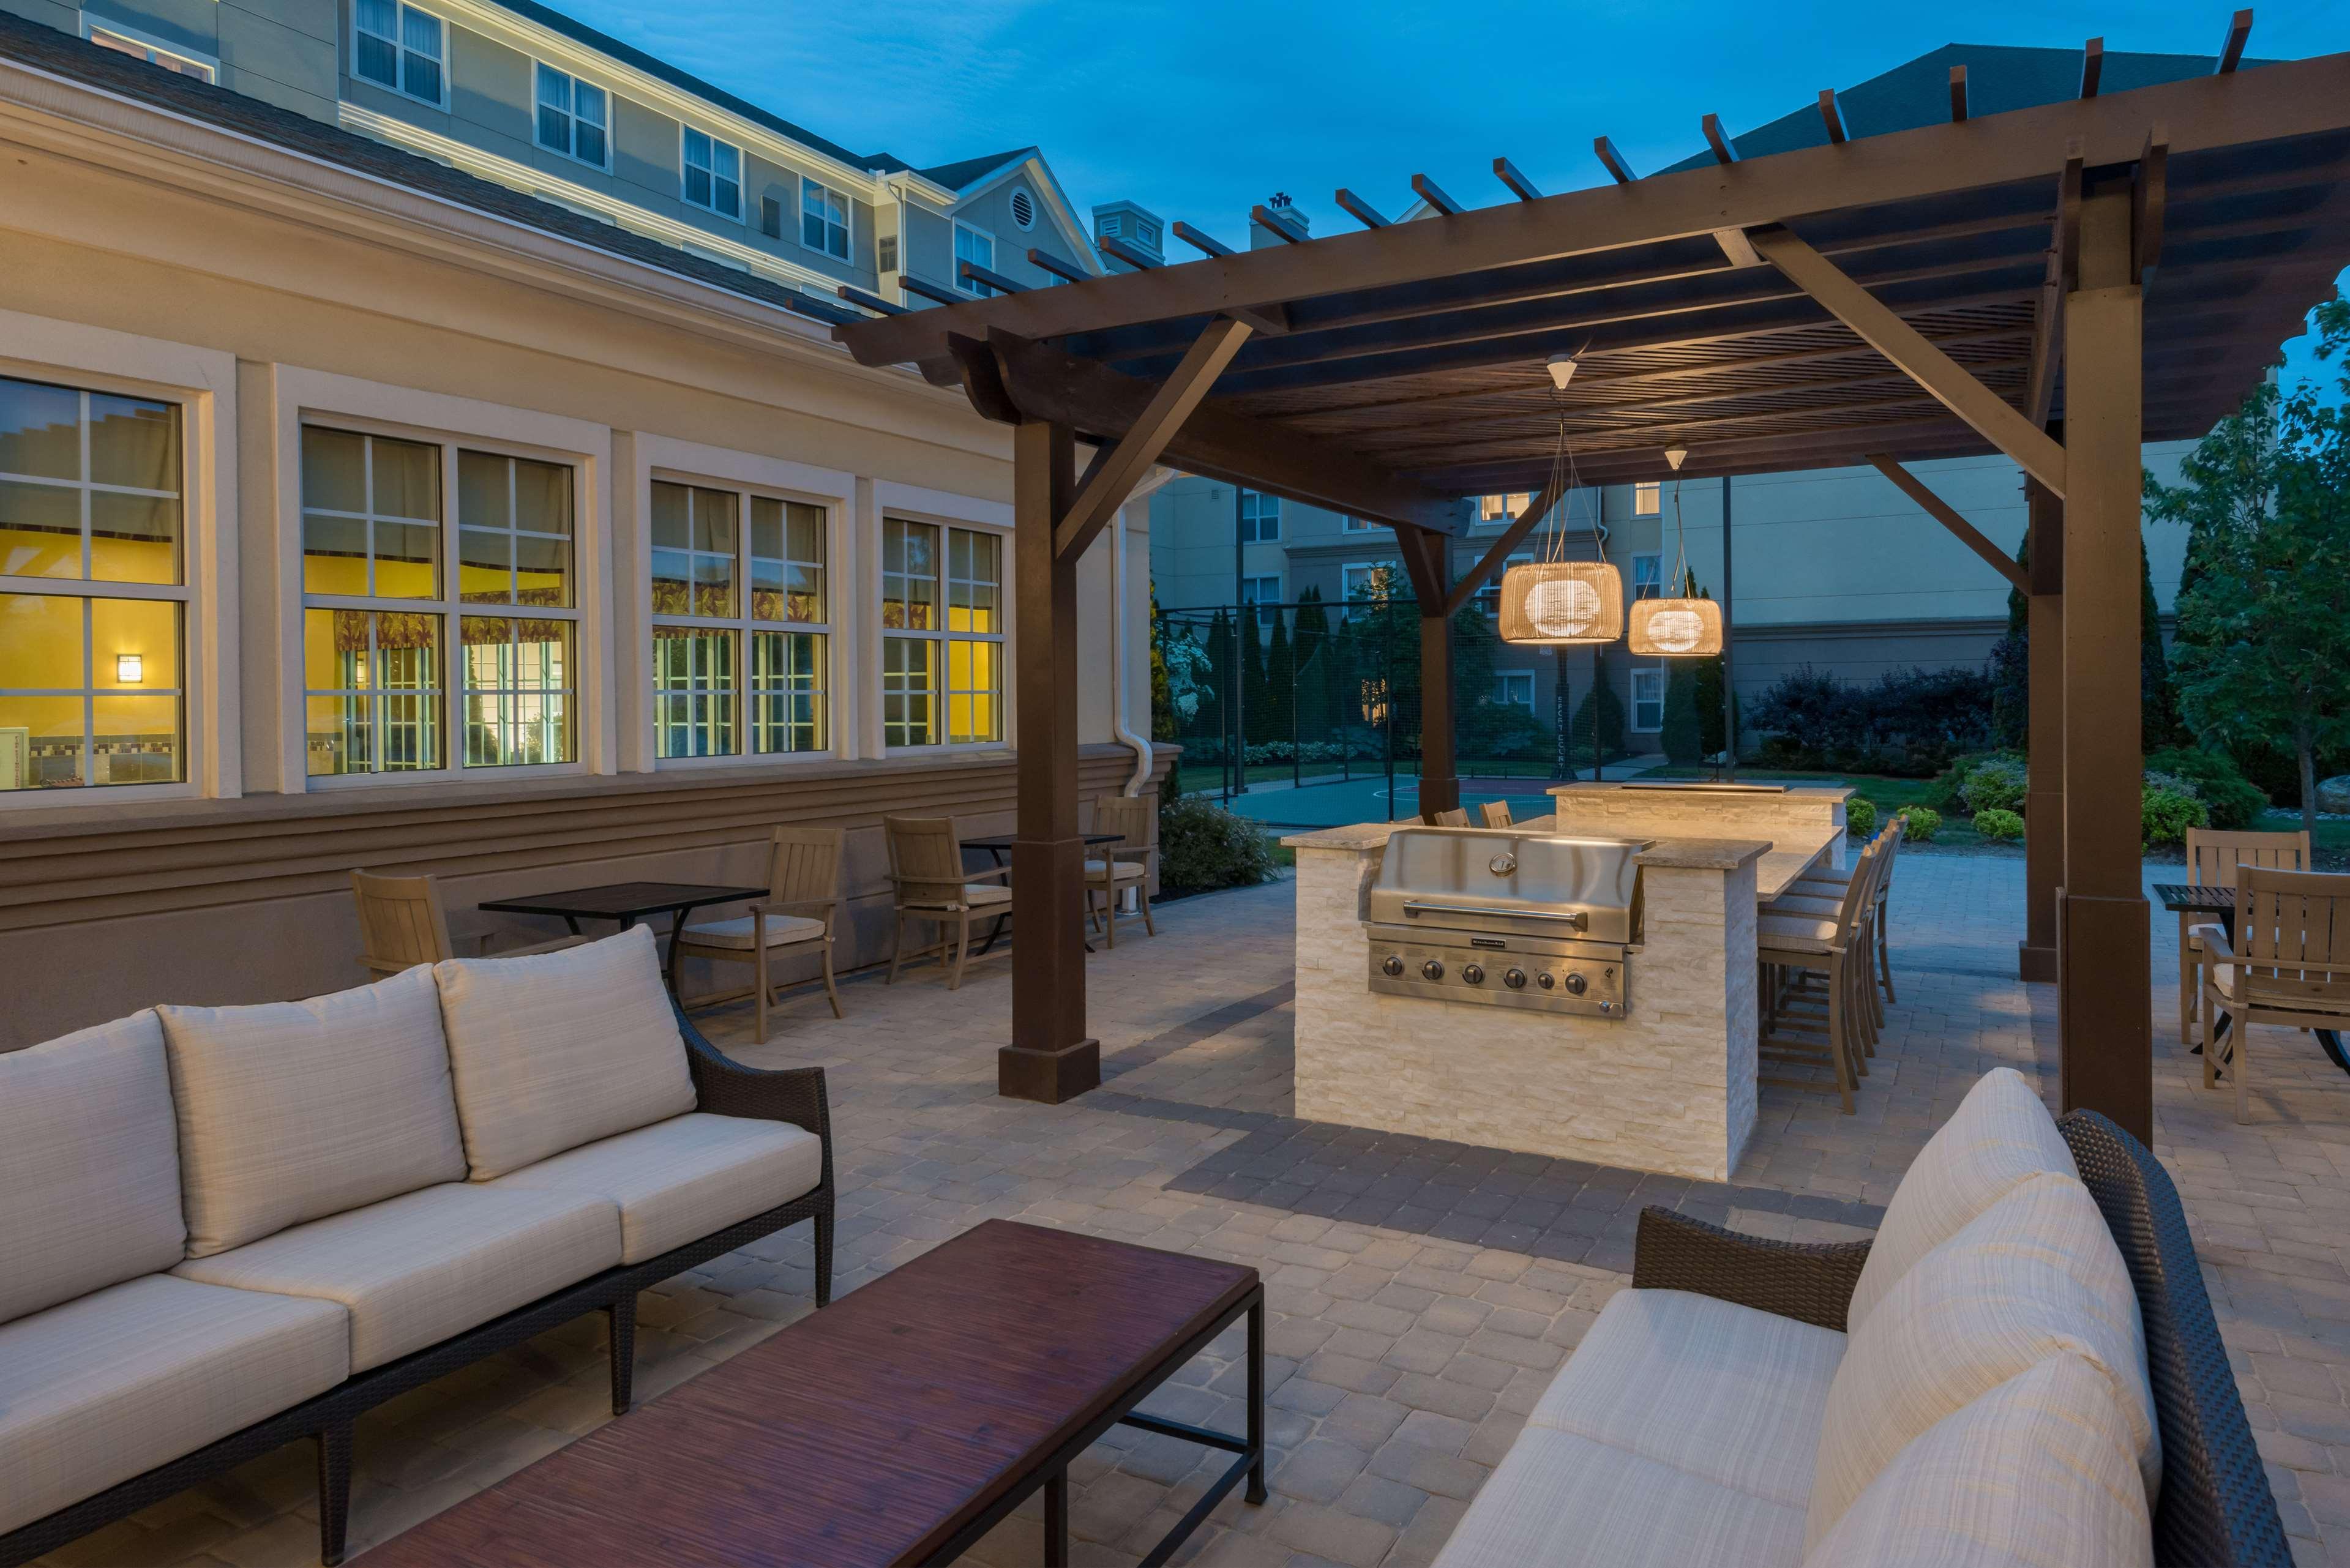 Homewood Suites by Hilton Holyoke-Springfield/North image 2